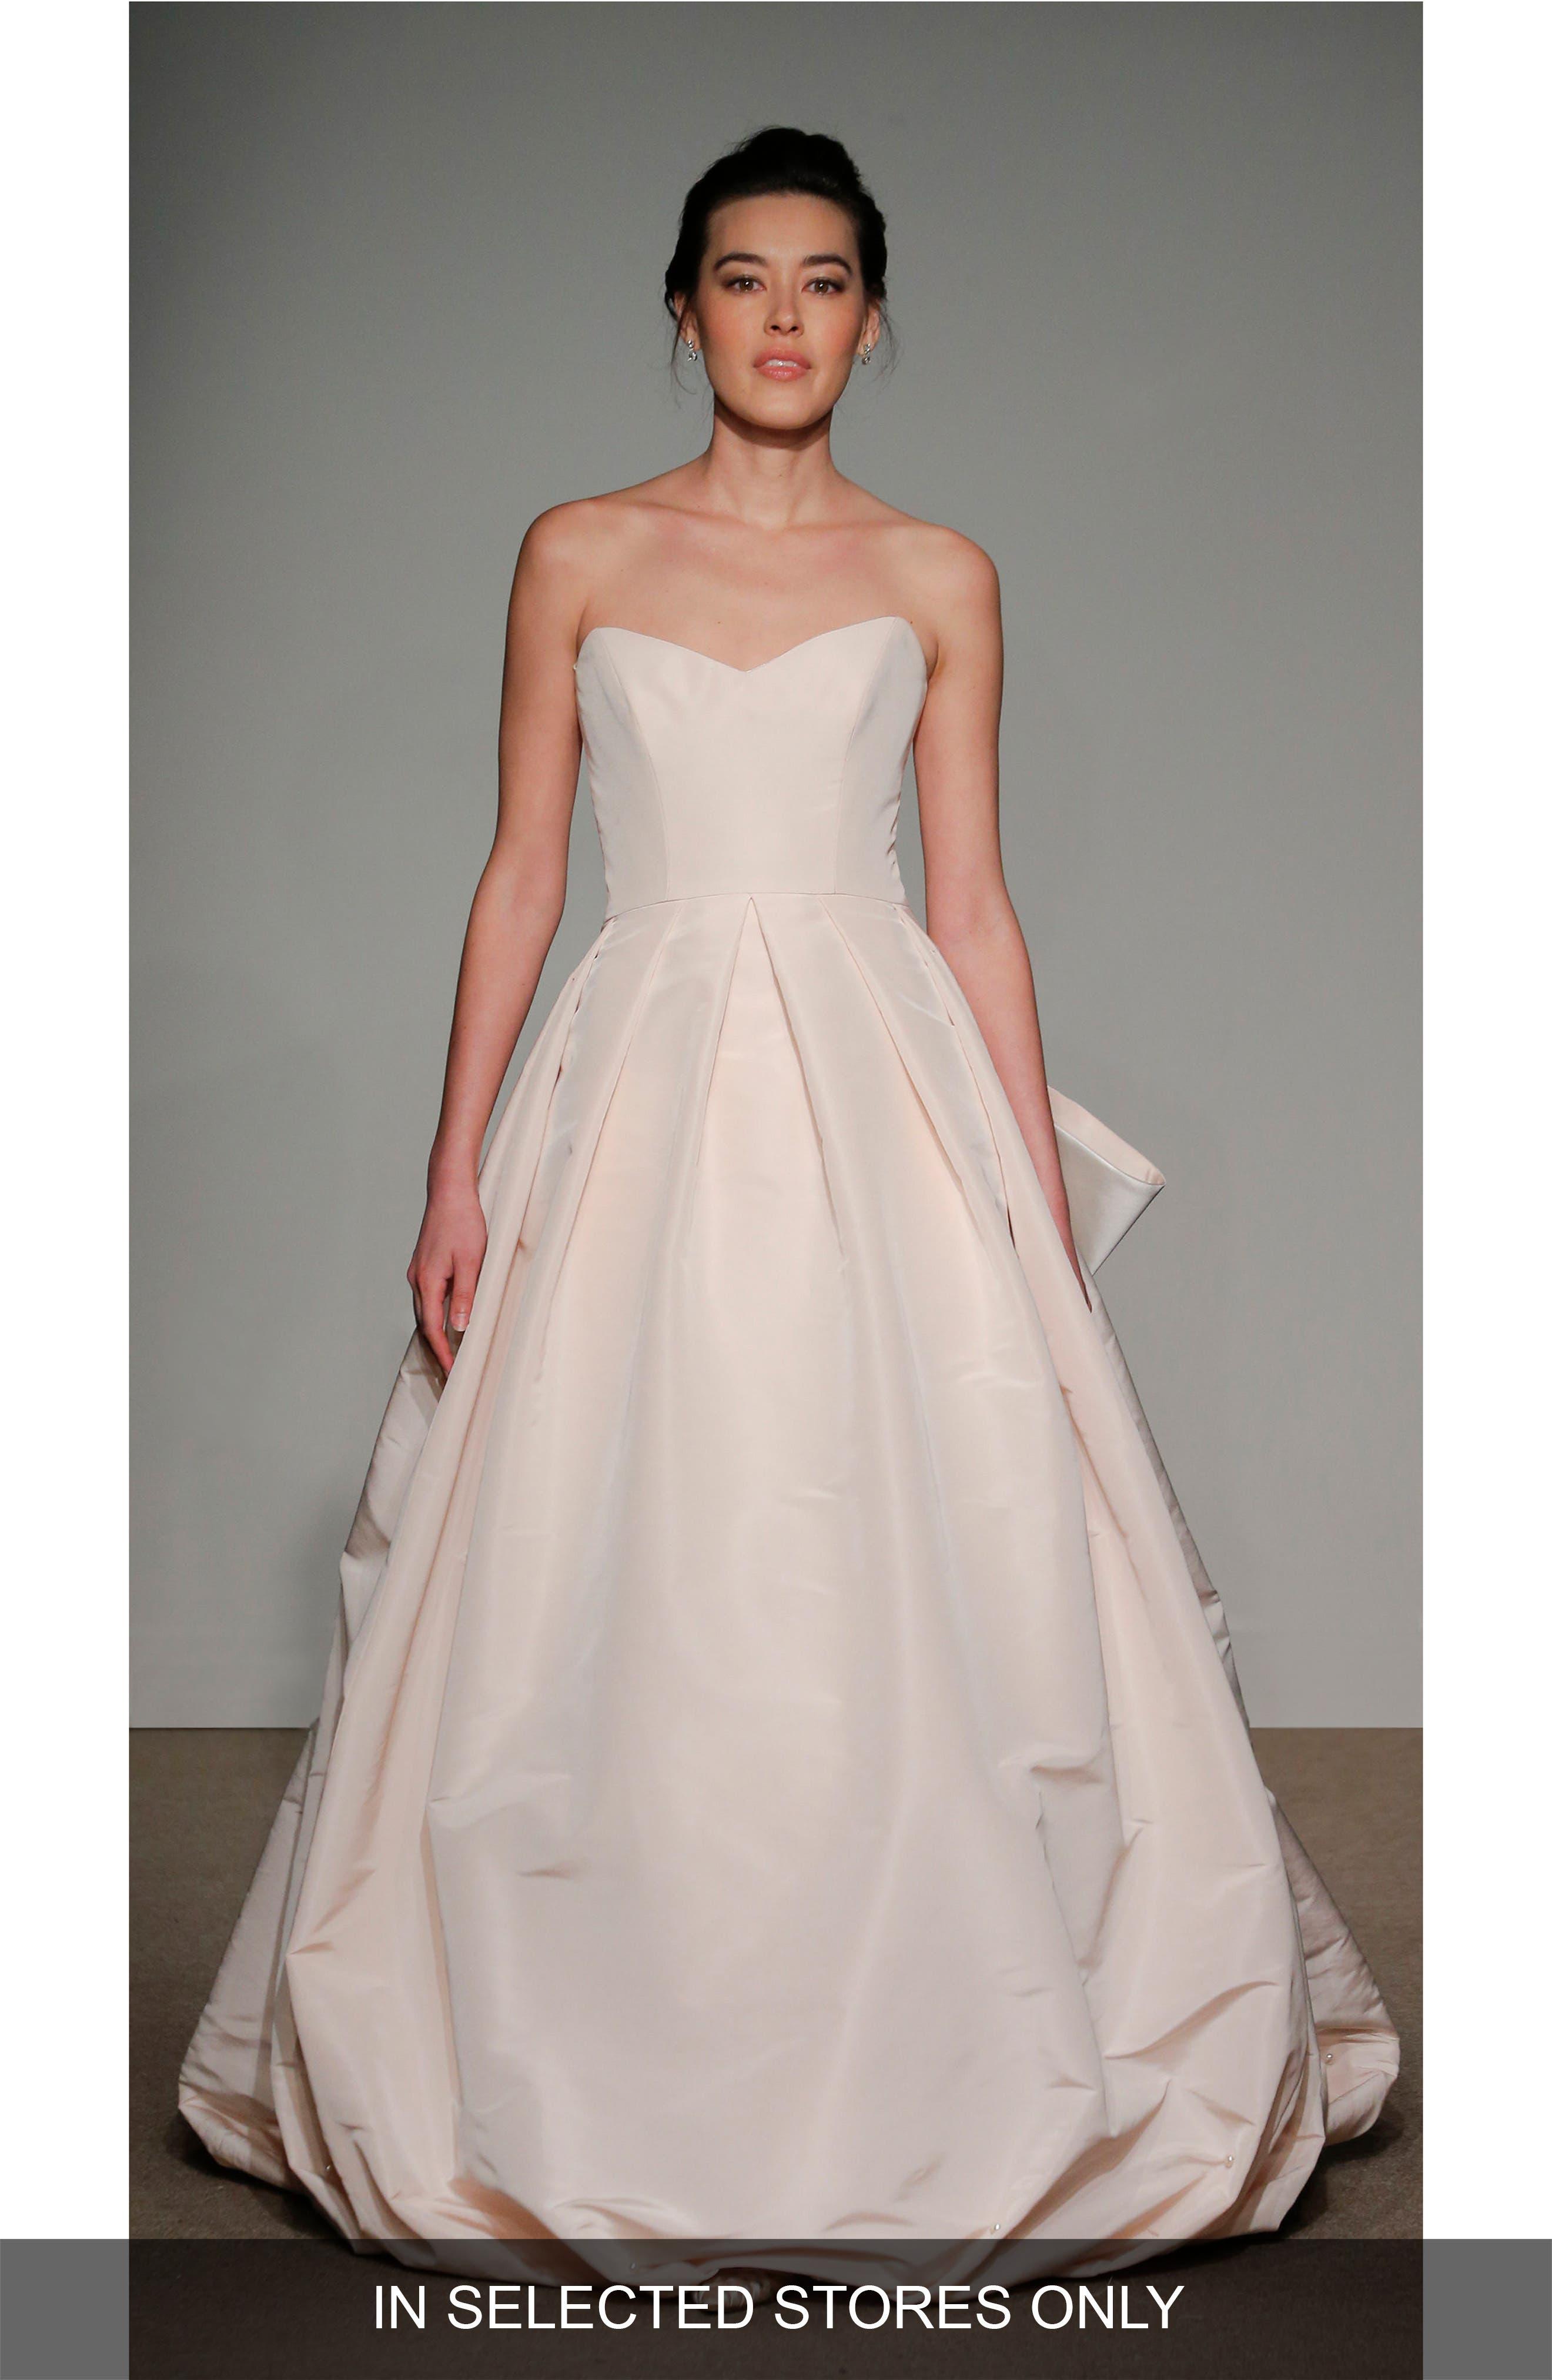 Cheri Bow Detail Strapless Faille Ballgown,                             Main thumbnail 1, color,                             Soft White